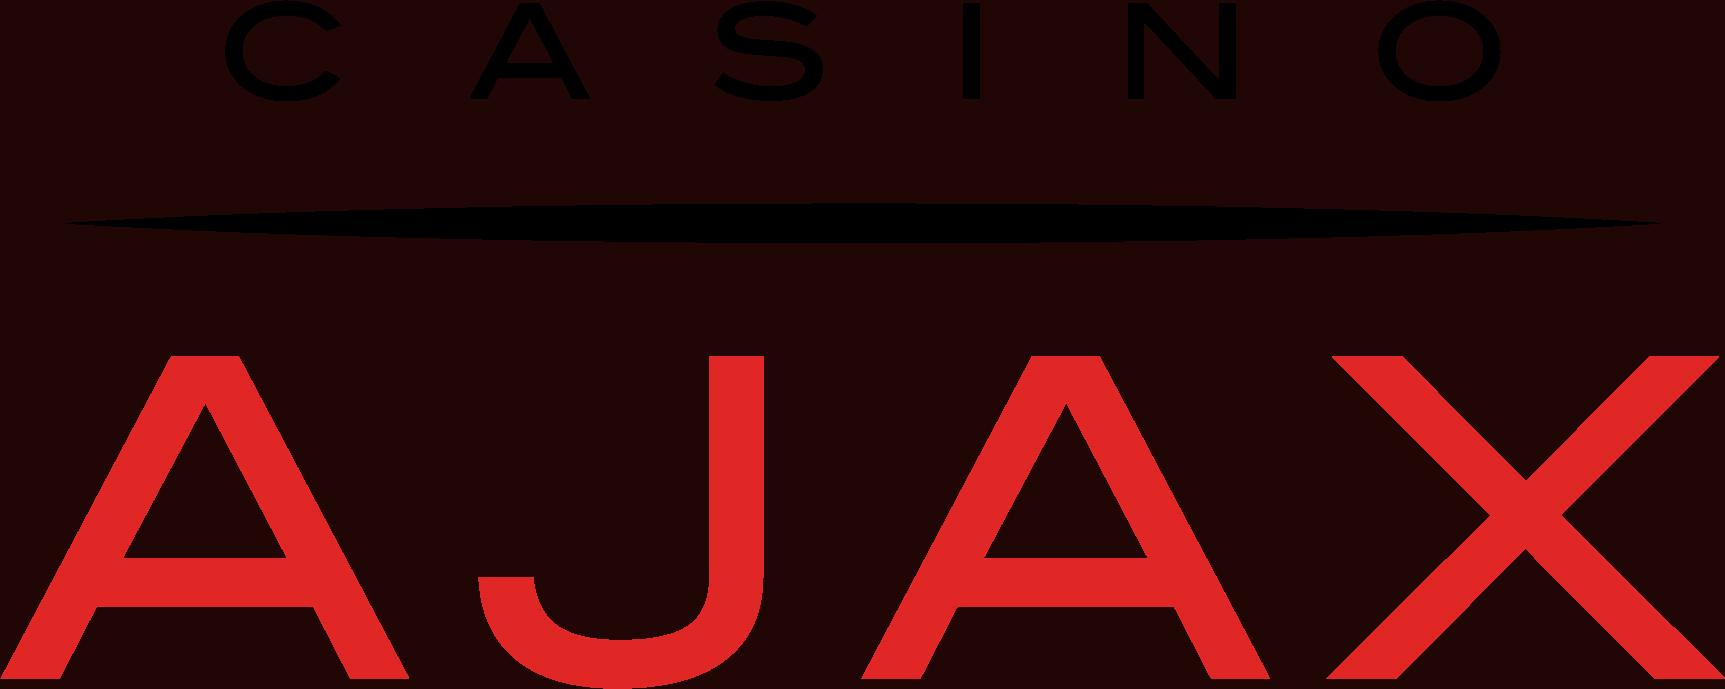 Ajax downs casino 17